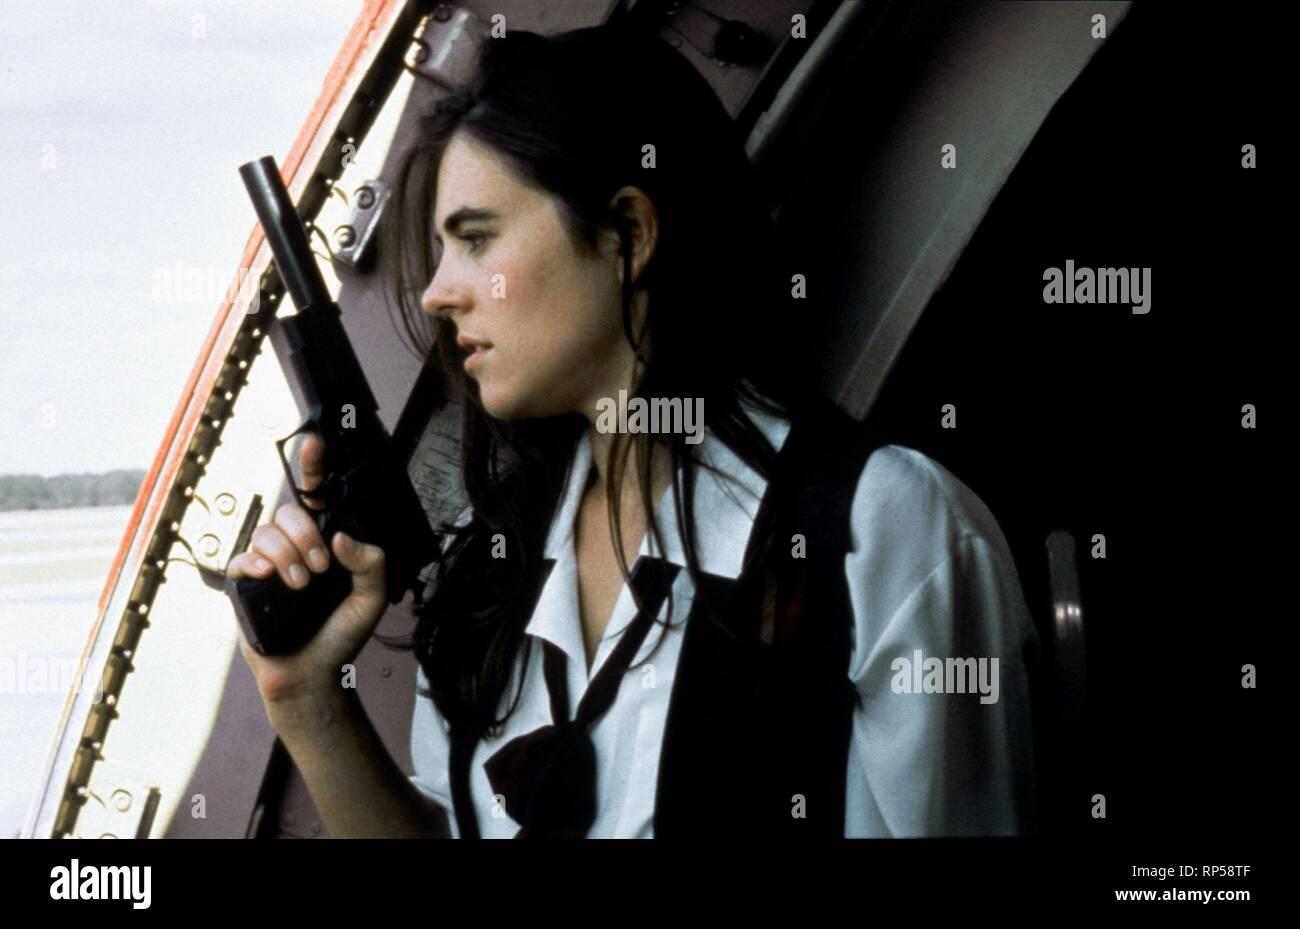 Passenger 57 Immagini e Fotos Stock - Alamy